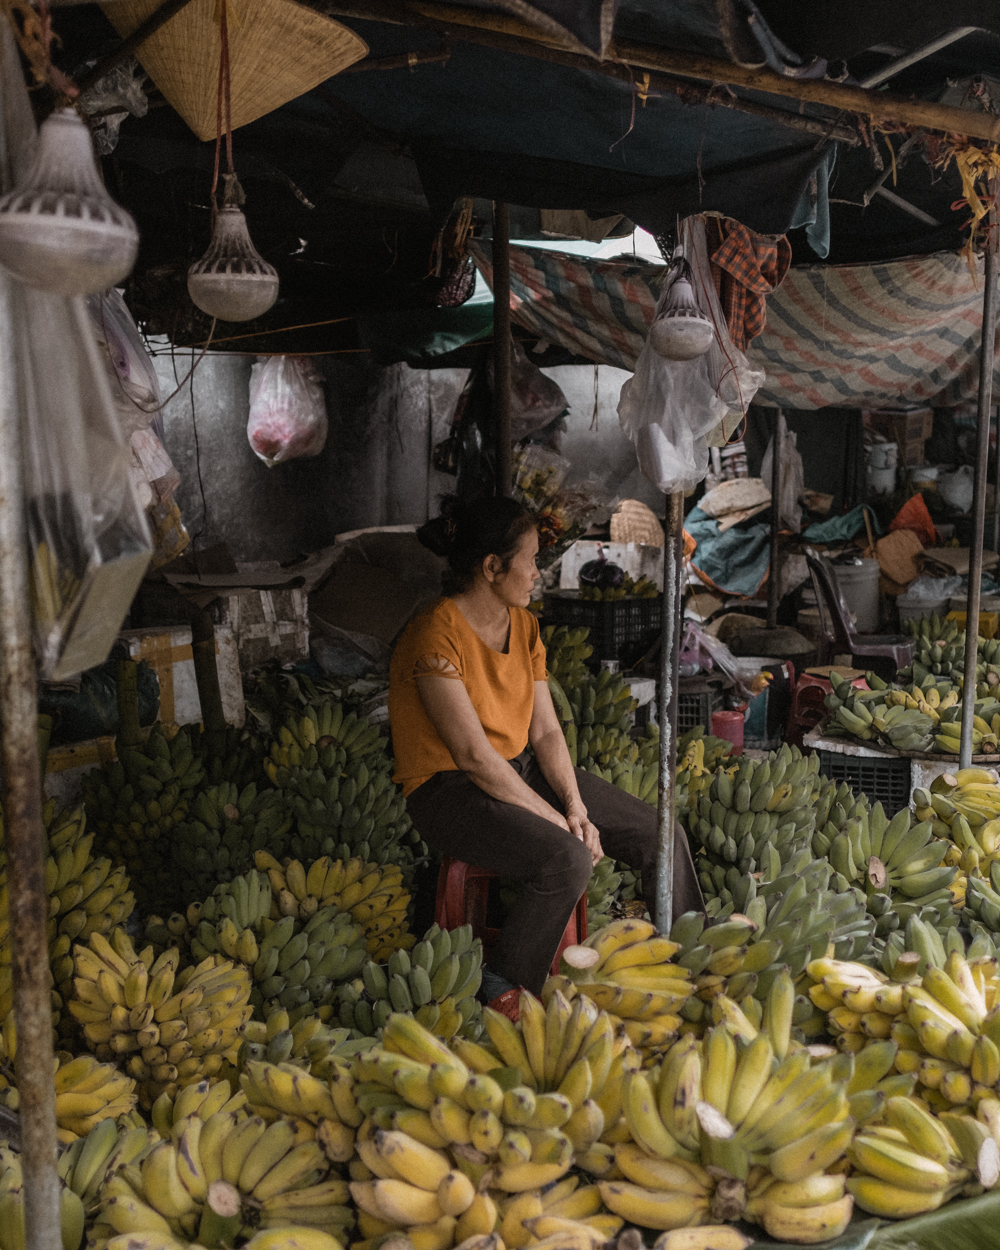 Vietnam-4-s.jpg